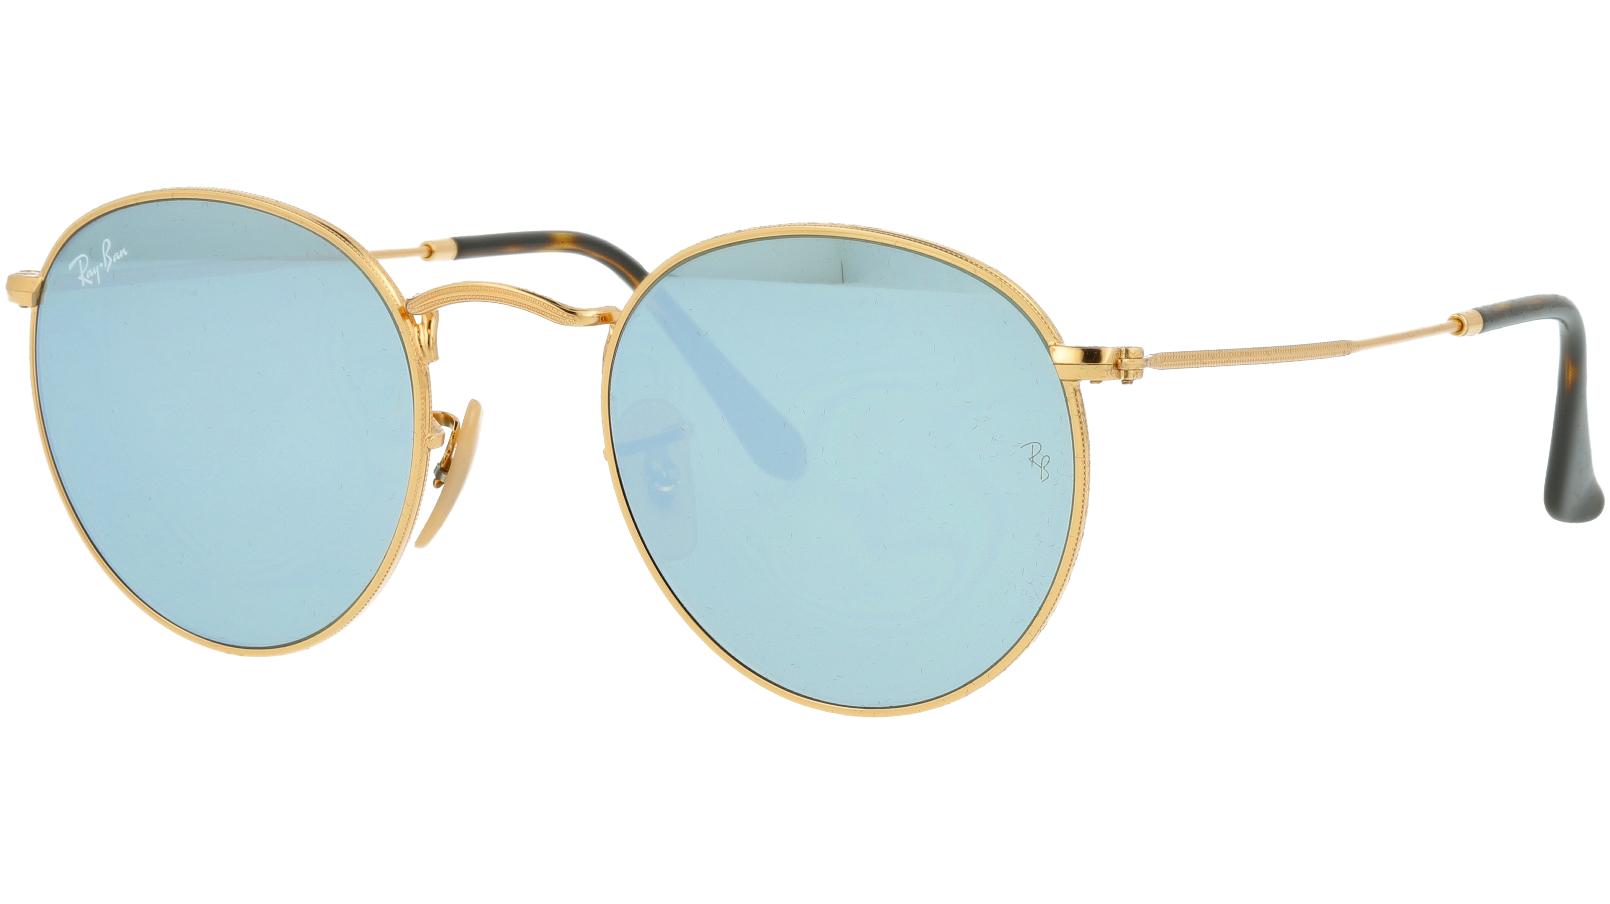 Ray-Ban RB3447N 001/30 Arista Round Sunglasses